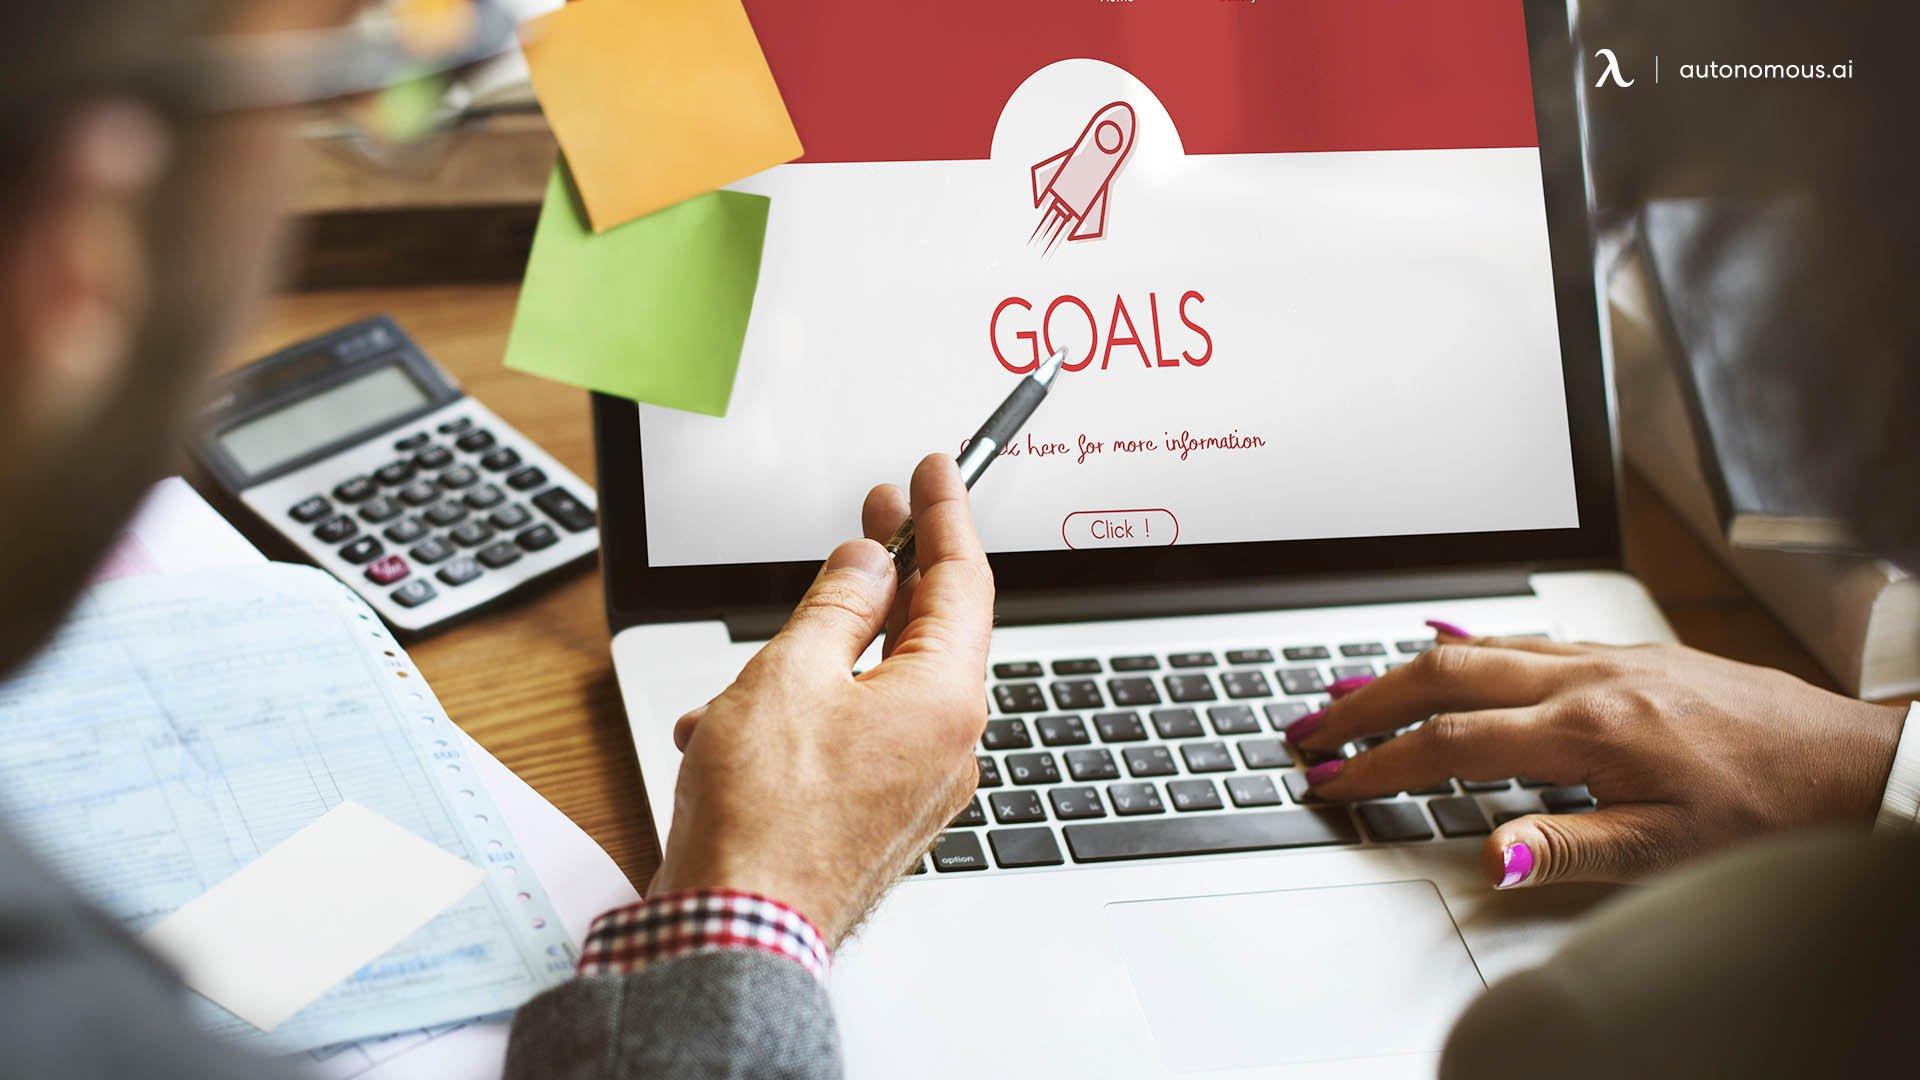 Focus on Business Goals